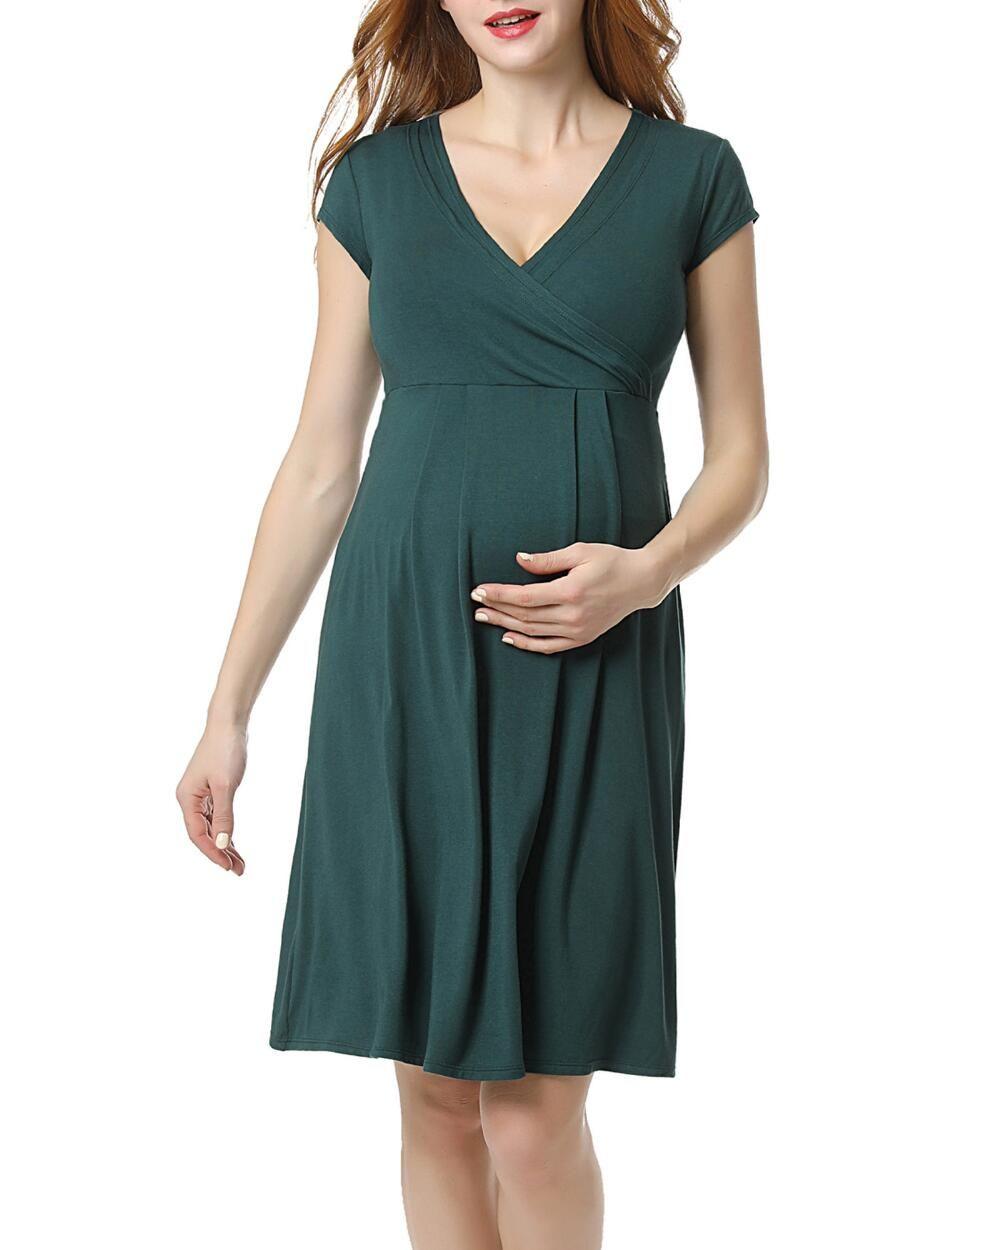 Glow Grow Maternity Nursing Night Gown S Rayon In 2020 Nursing Gown Night Gown Nursing Nightgown [ 1250 x 1000 Pixel ]